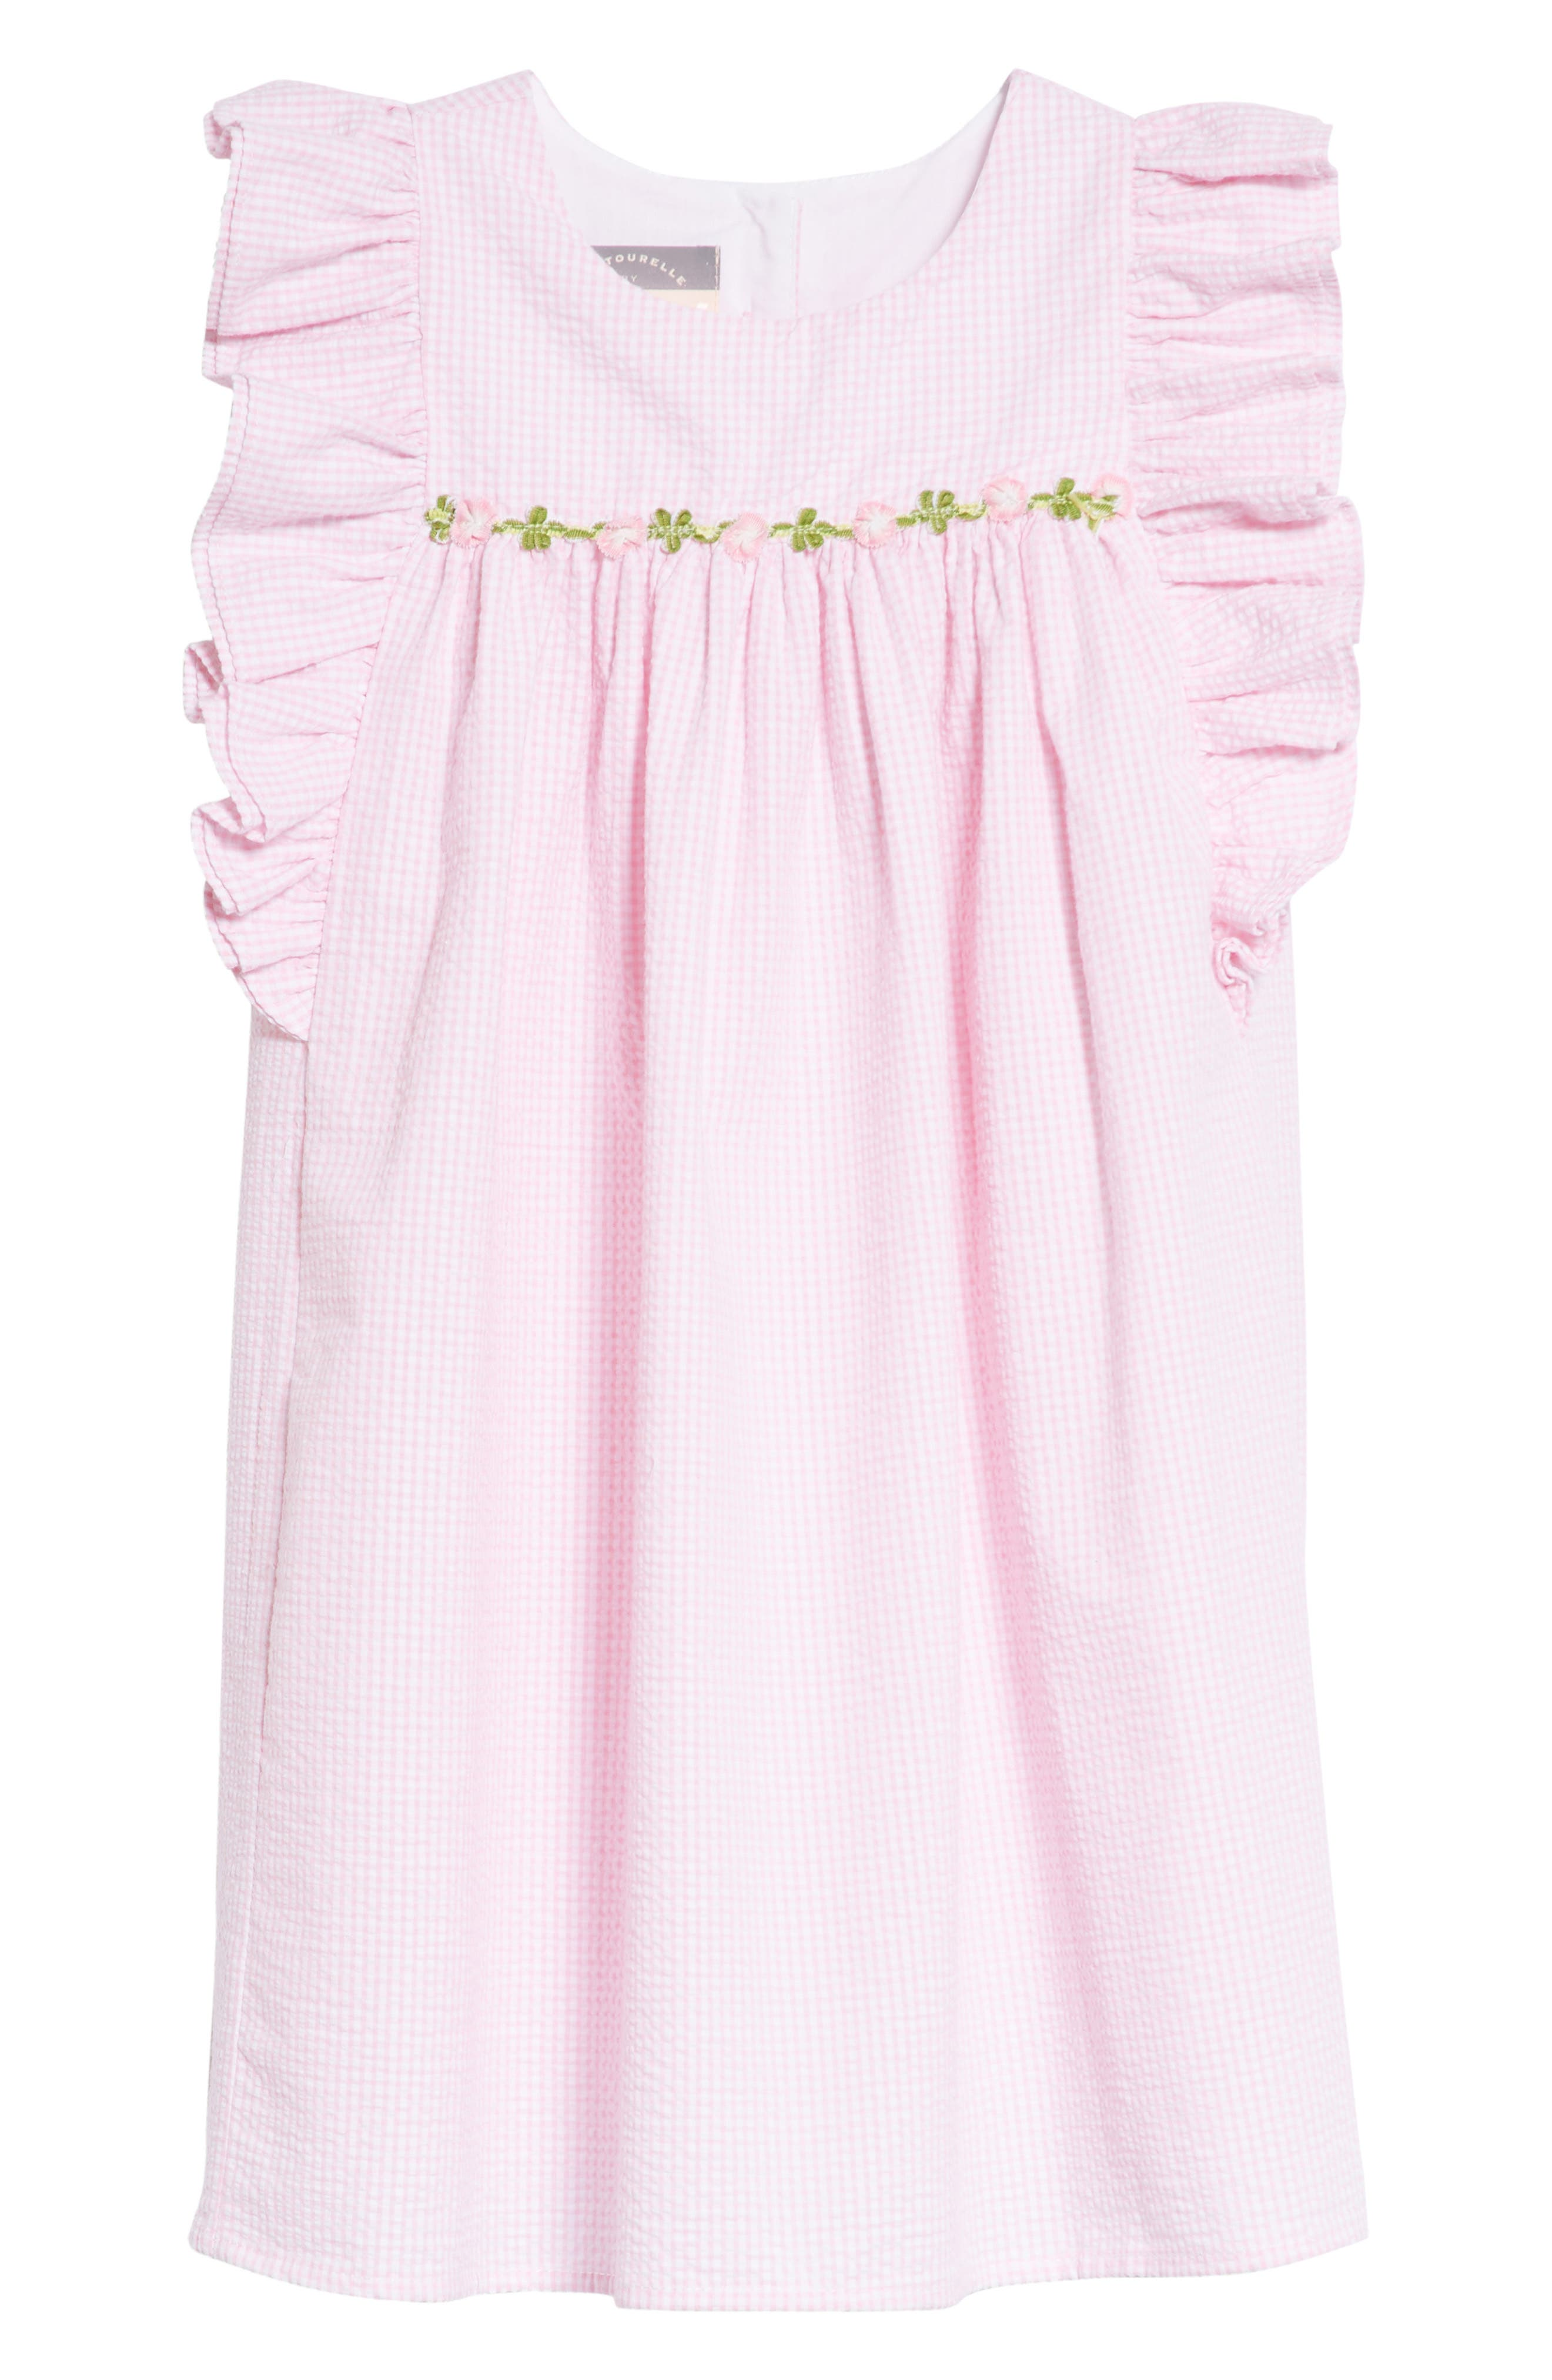 Seersucker Ruffle Sleeve Dress,                             Main thumbnail 1, color,